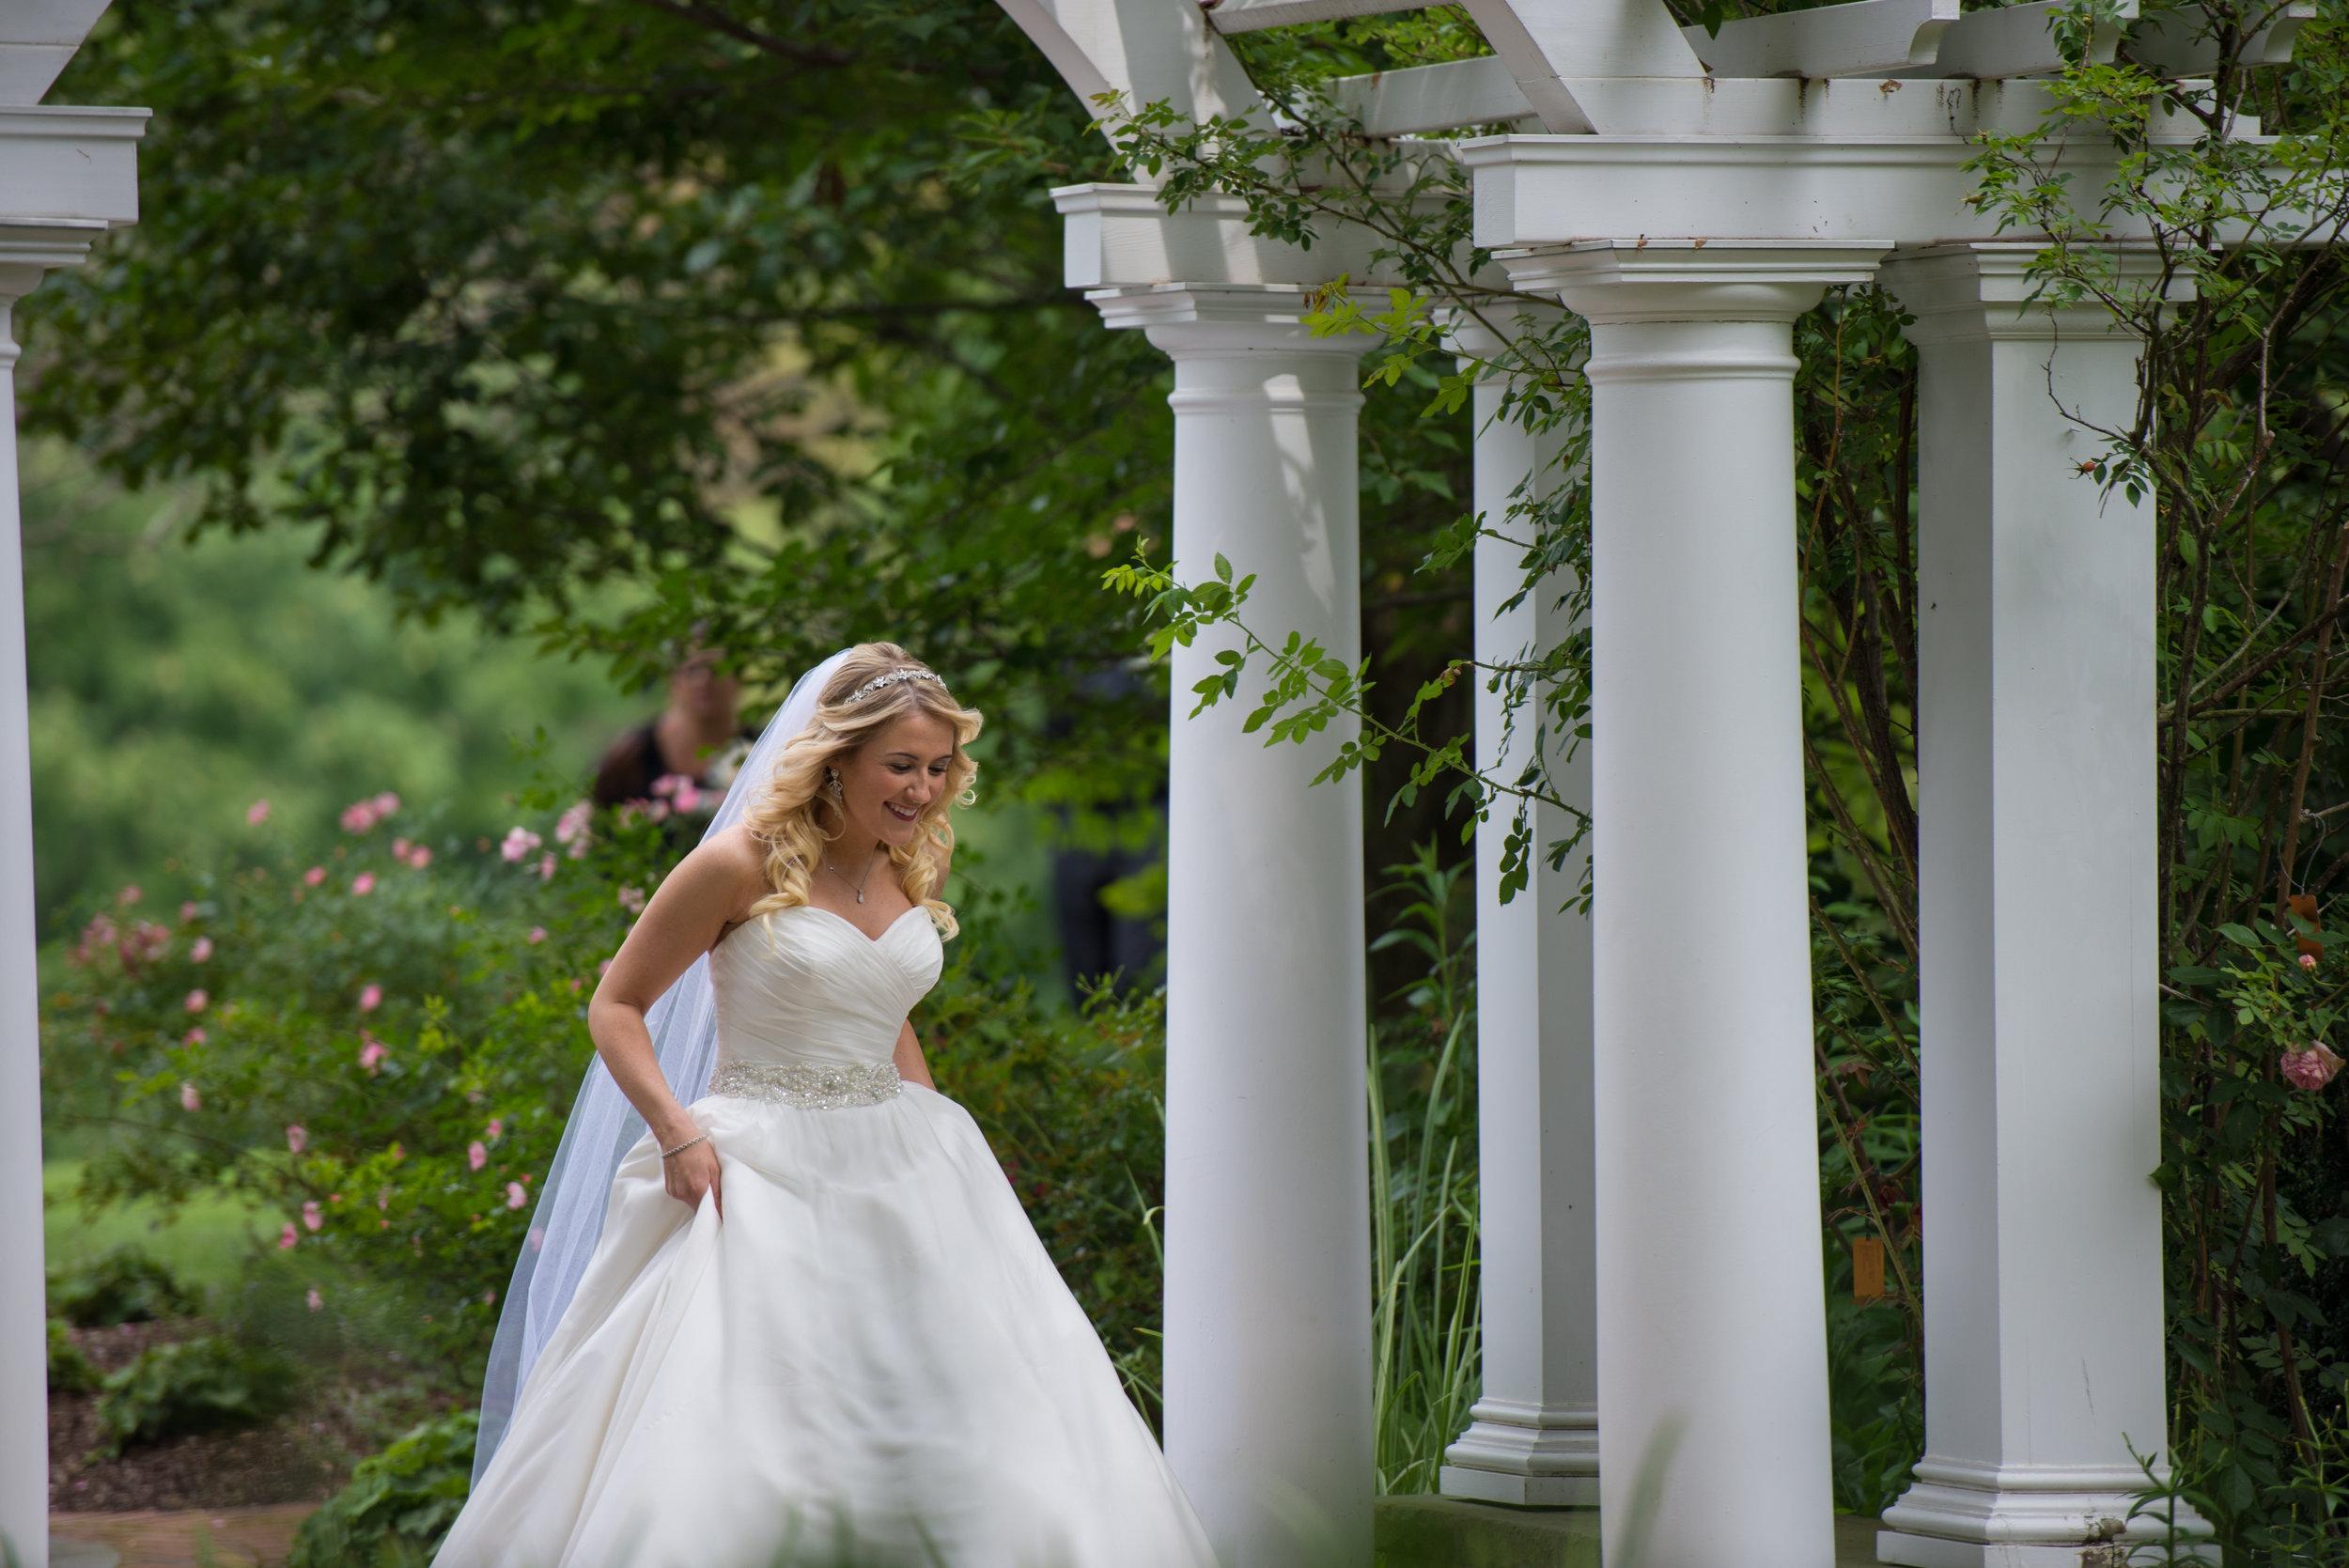 Wedding First Look Photos00910.jpg